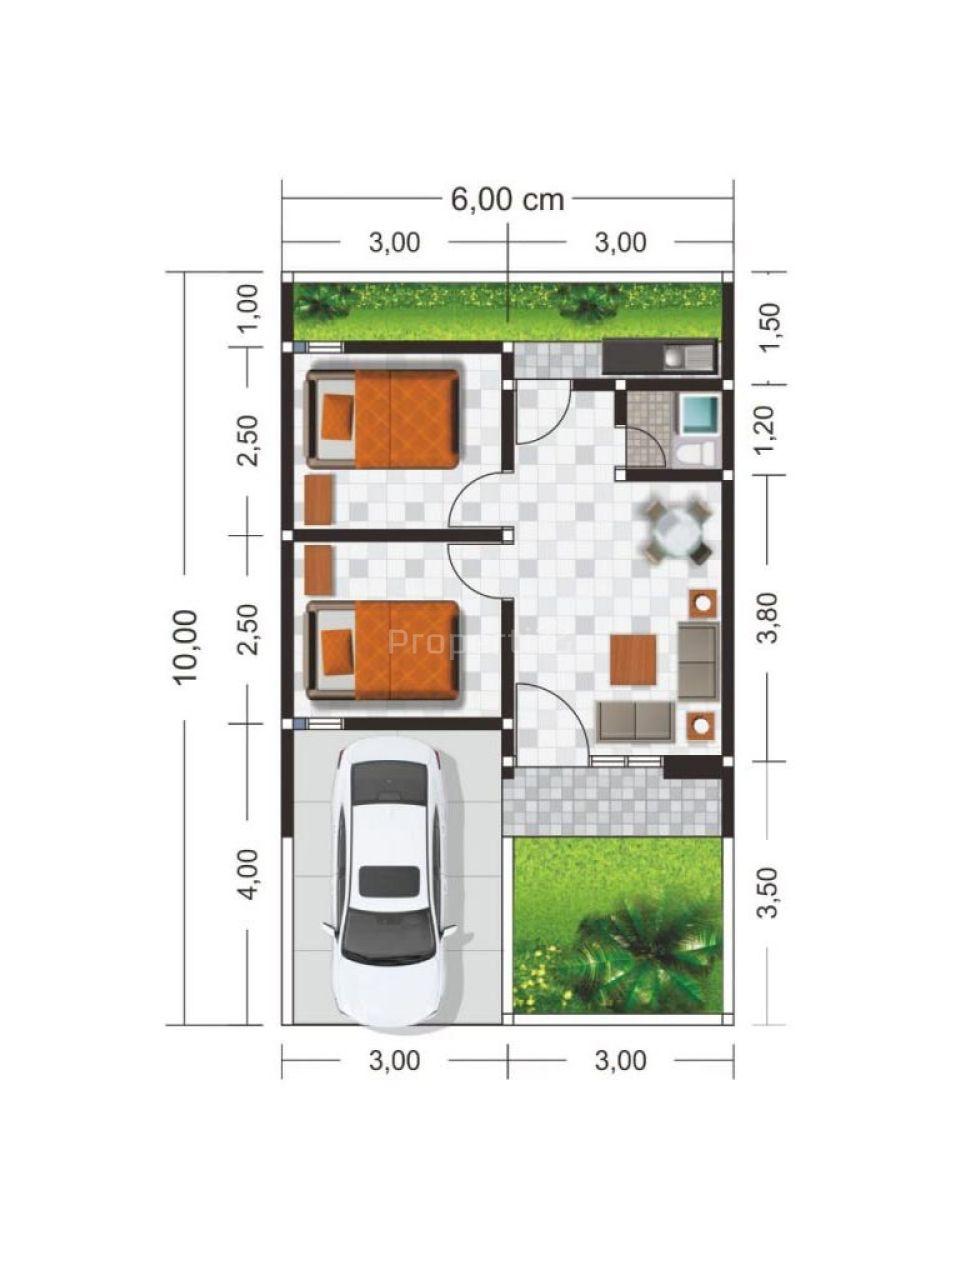 Simple House in Strategic Residential in Sukodono, Jawa Timur